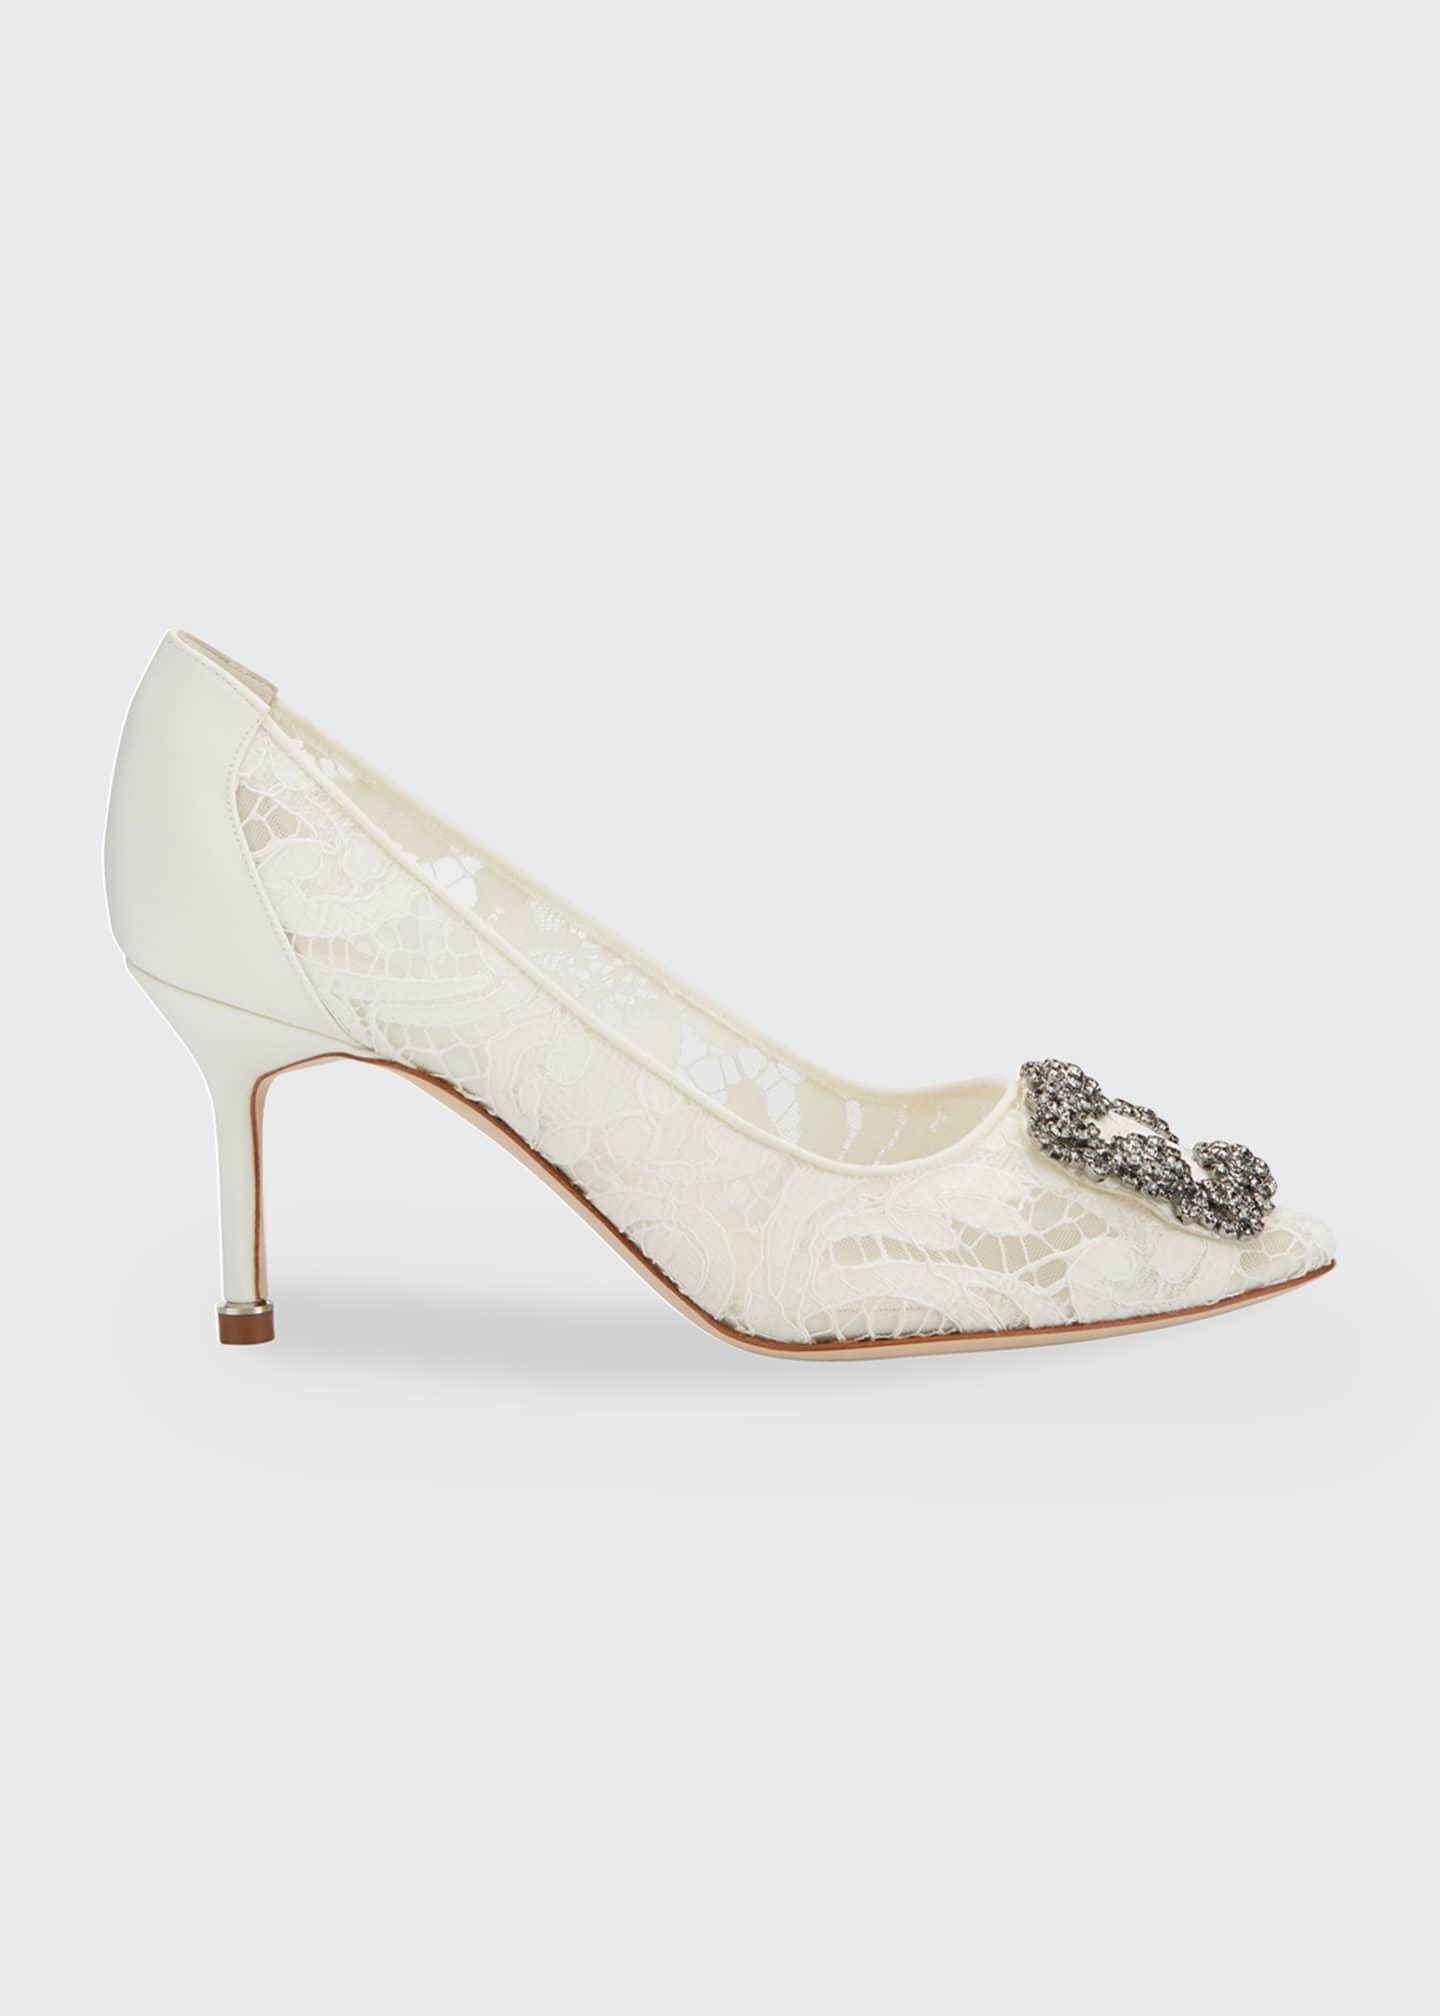 MANOLO BLAHNIK 高跟鞋